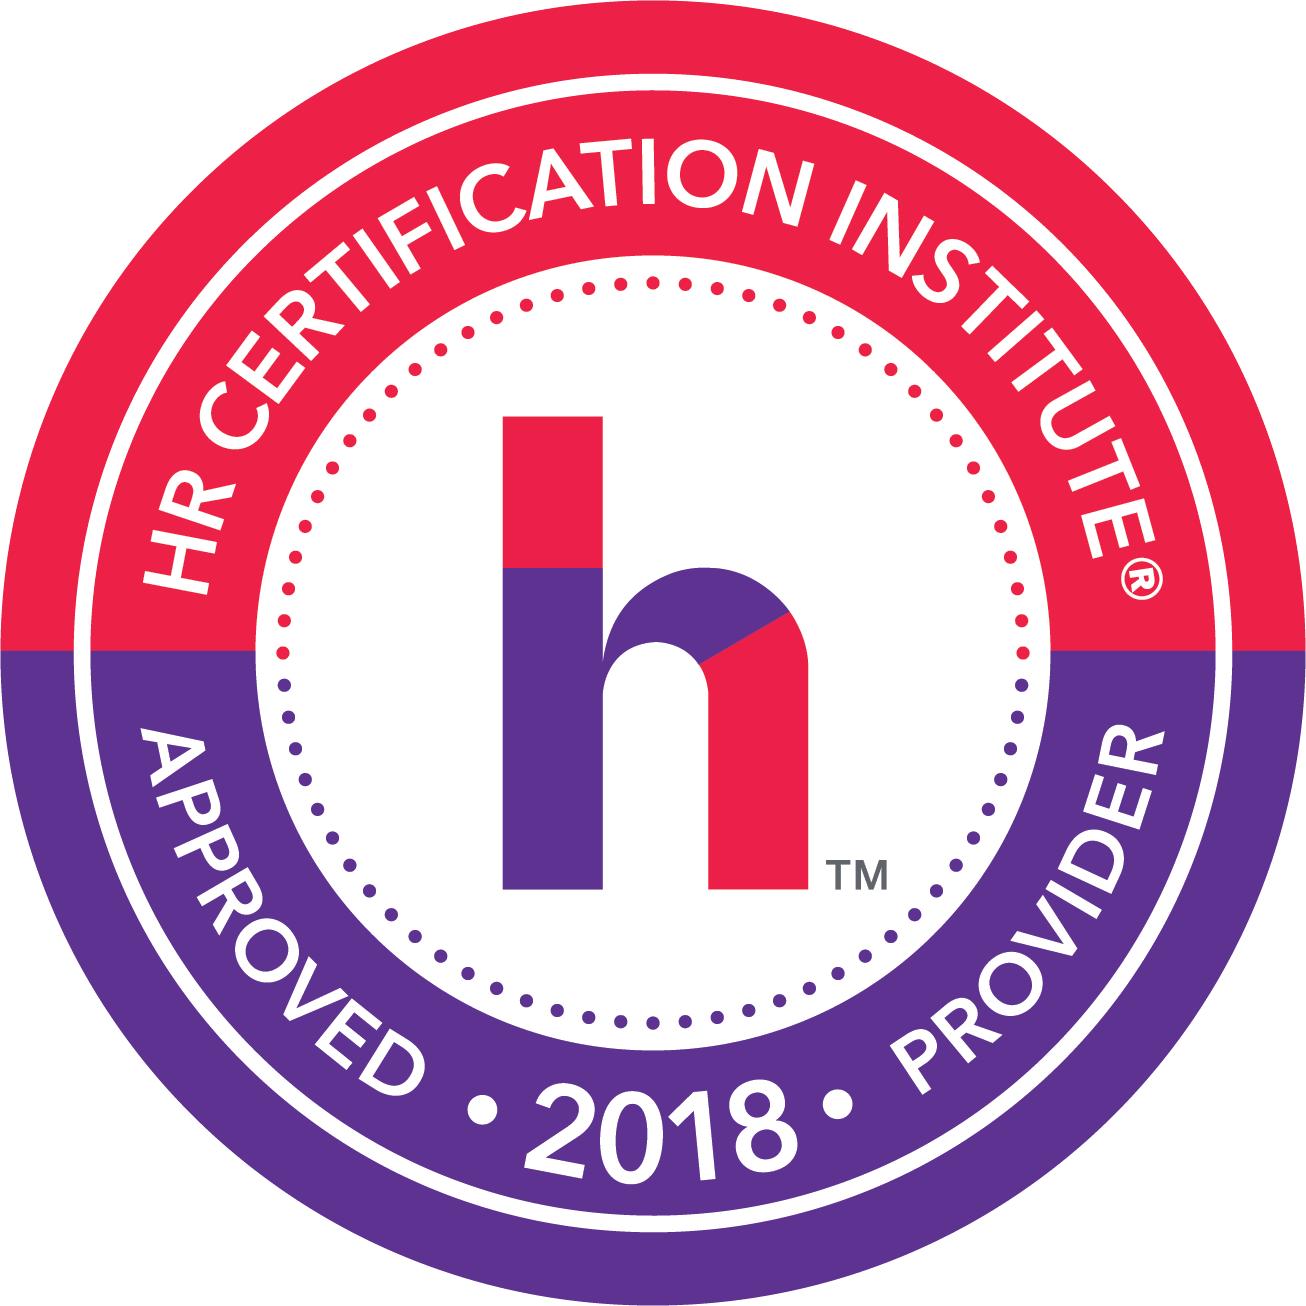 HCRI Seal